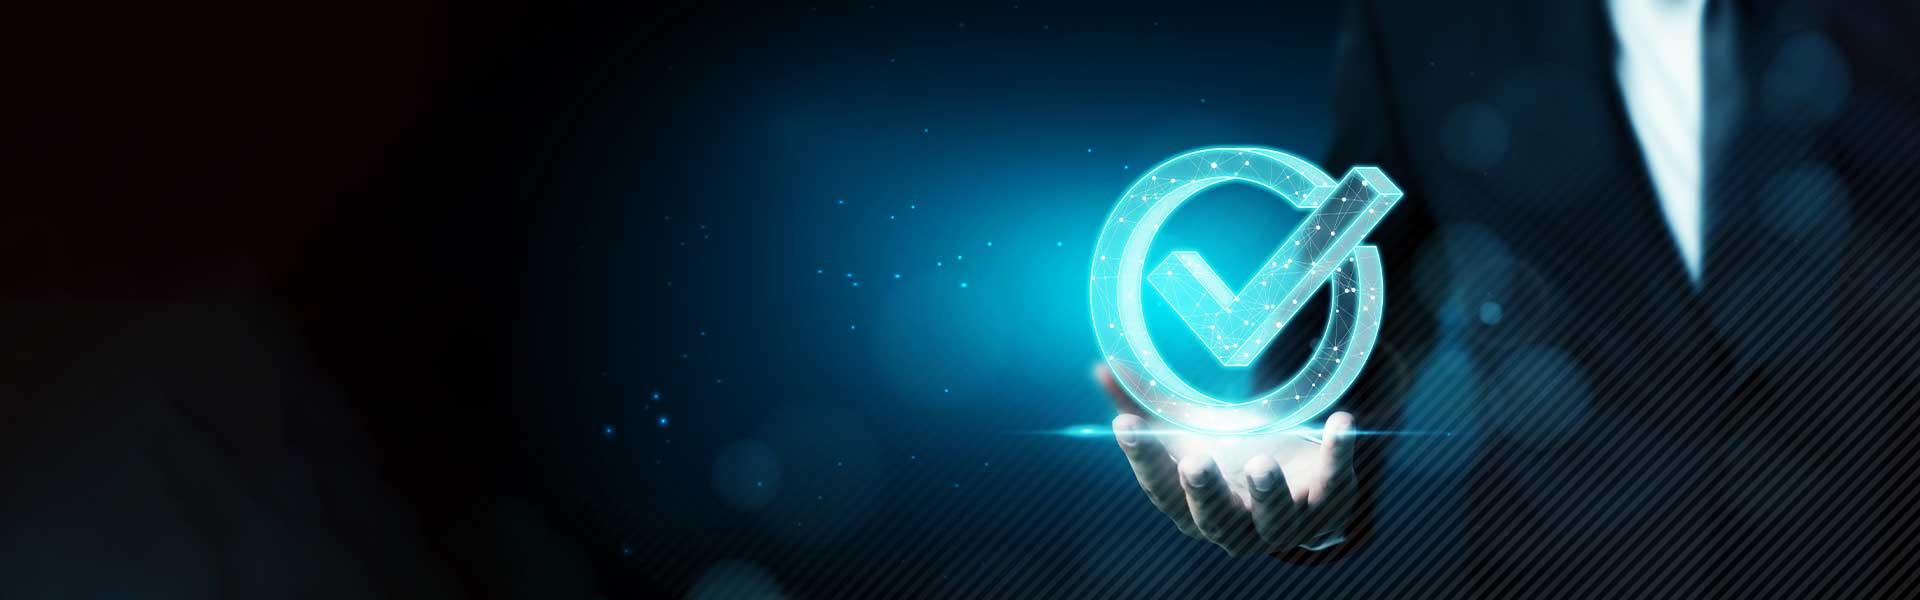 Quantron-AG_ISO-Zertifizierung_Header_600px